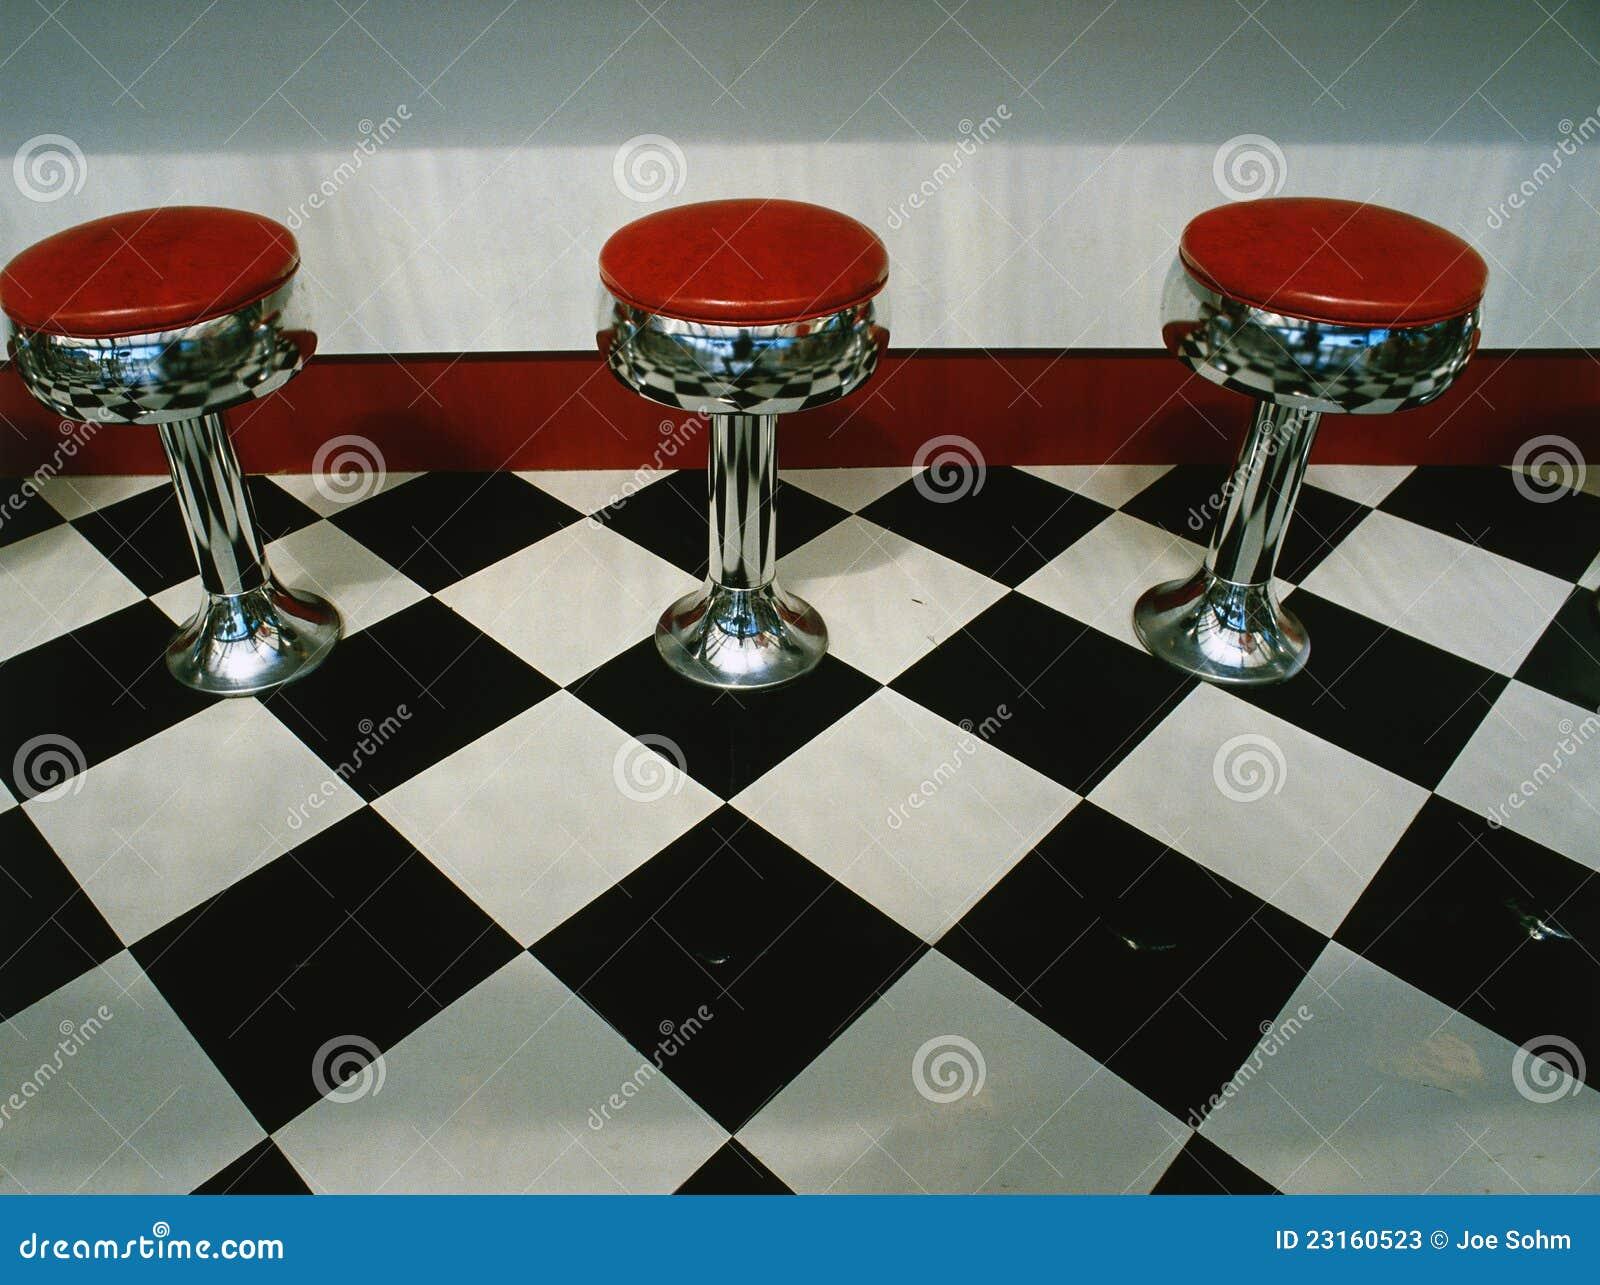 Art deco style restaurant stock photos image 23160523 for Art deco look